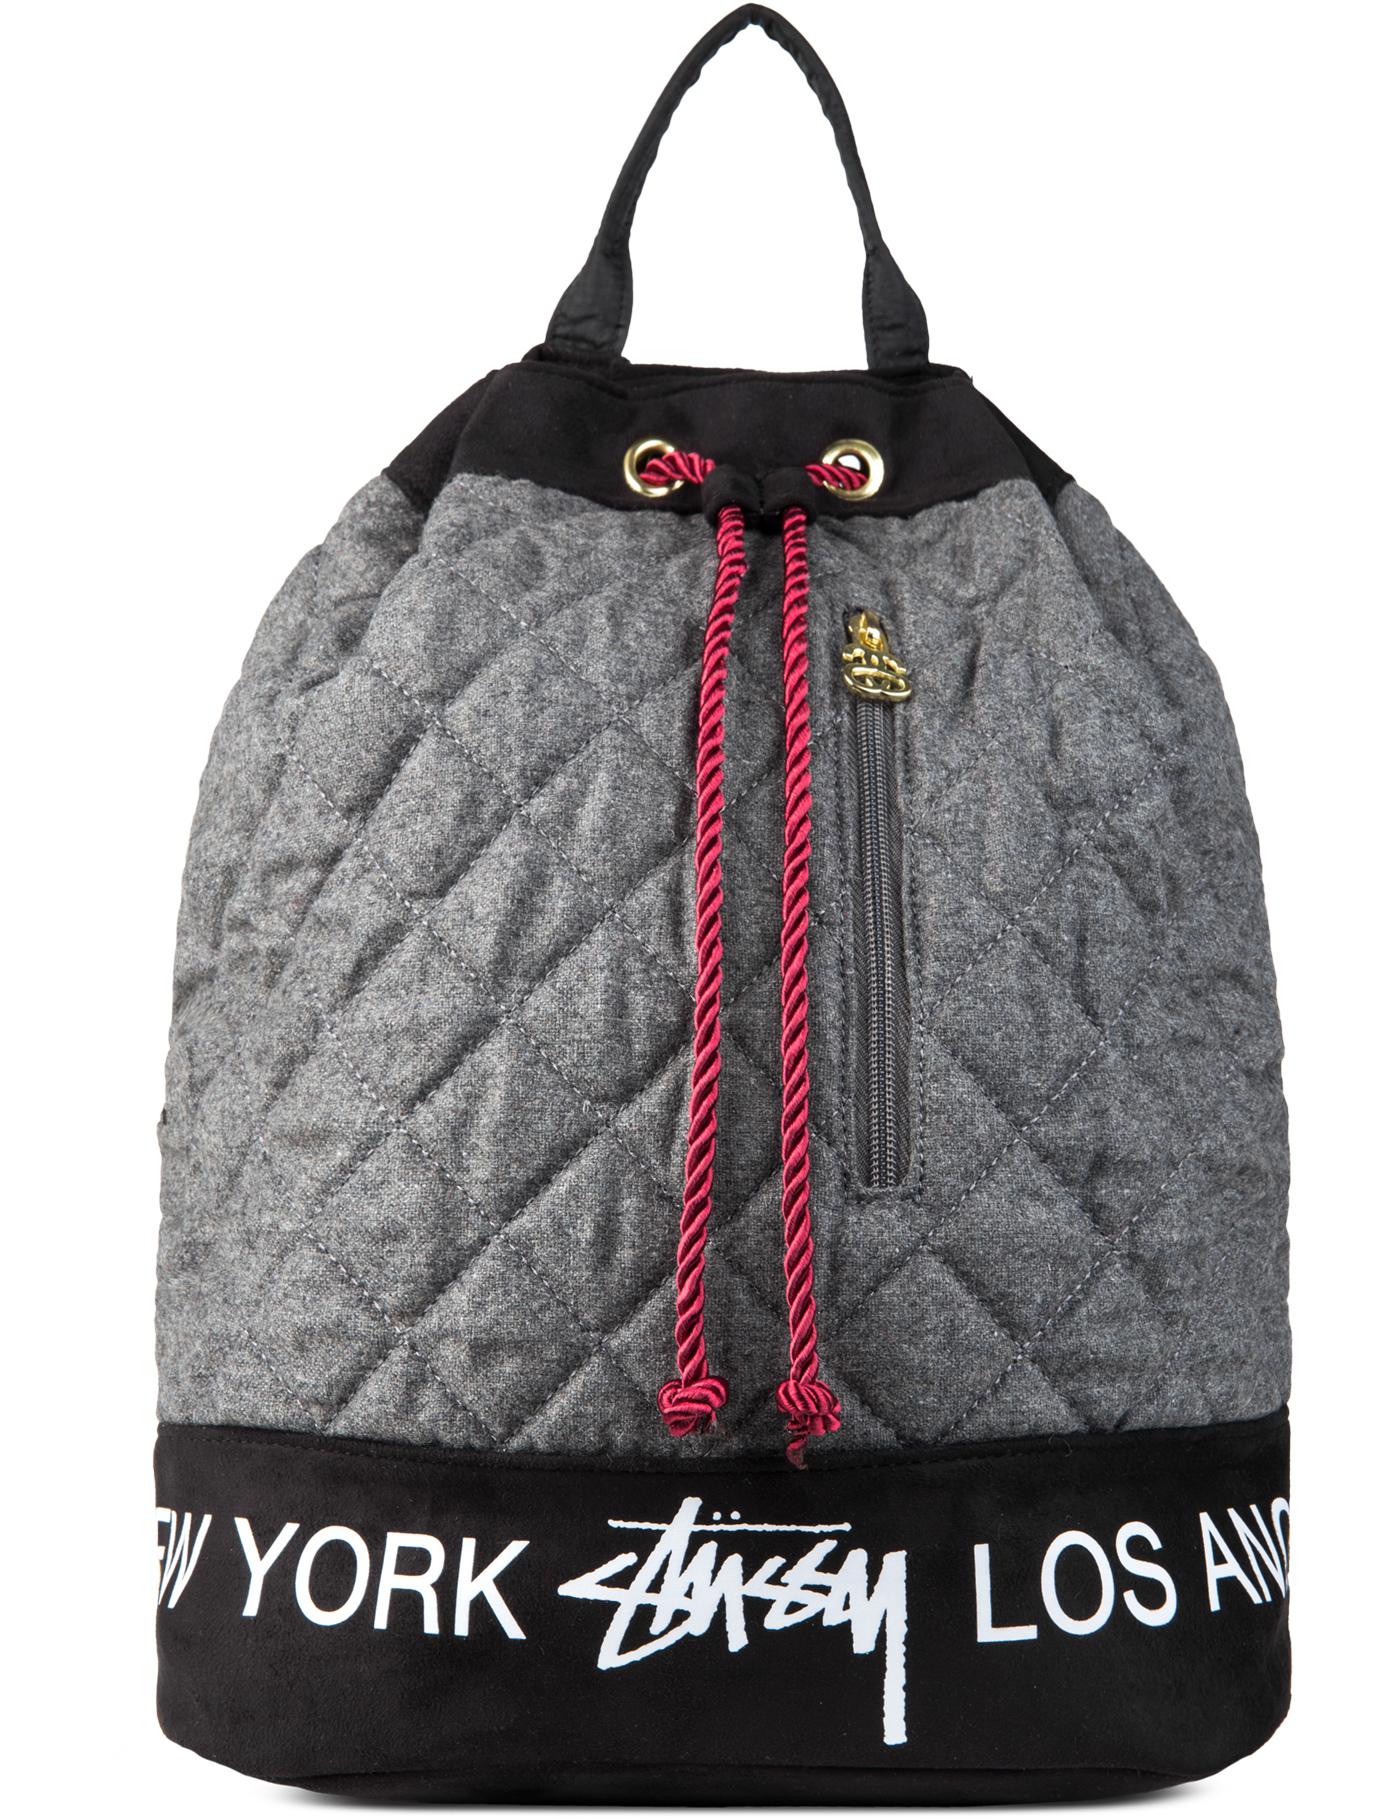 Stussy Wt Bucket Backpack   HBX.